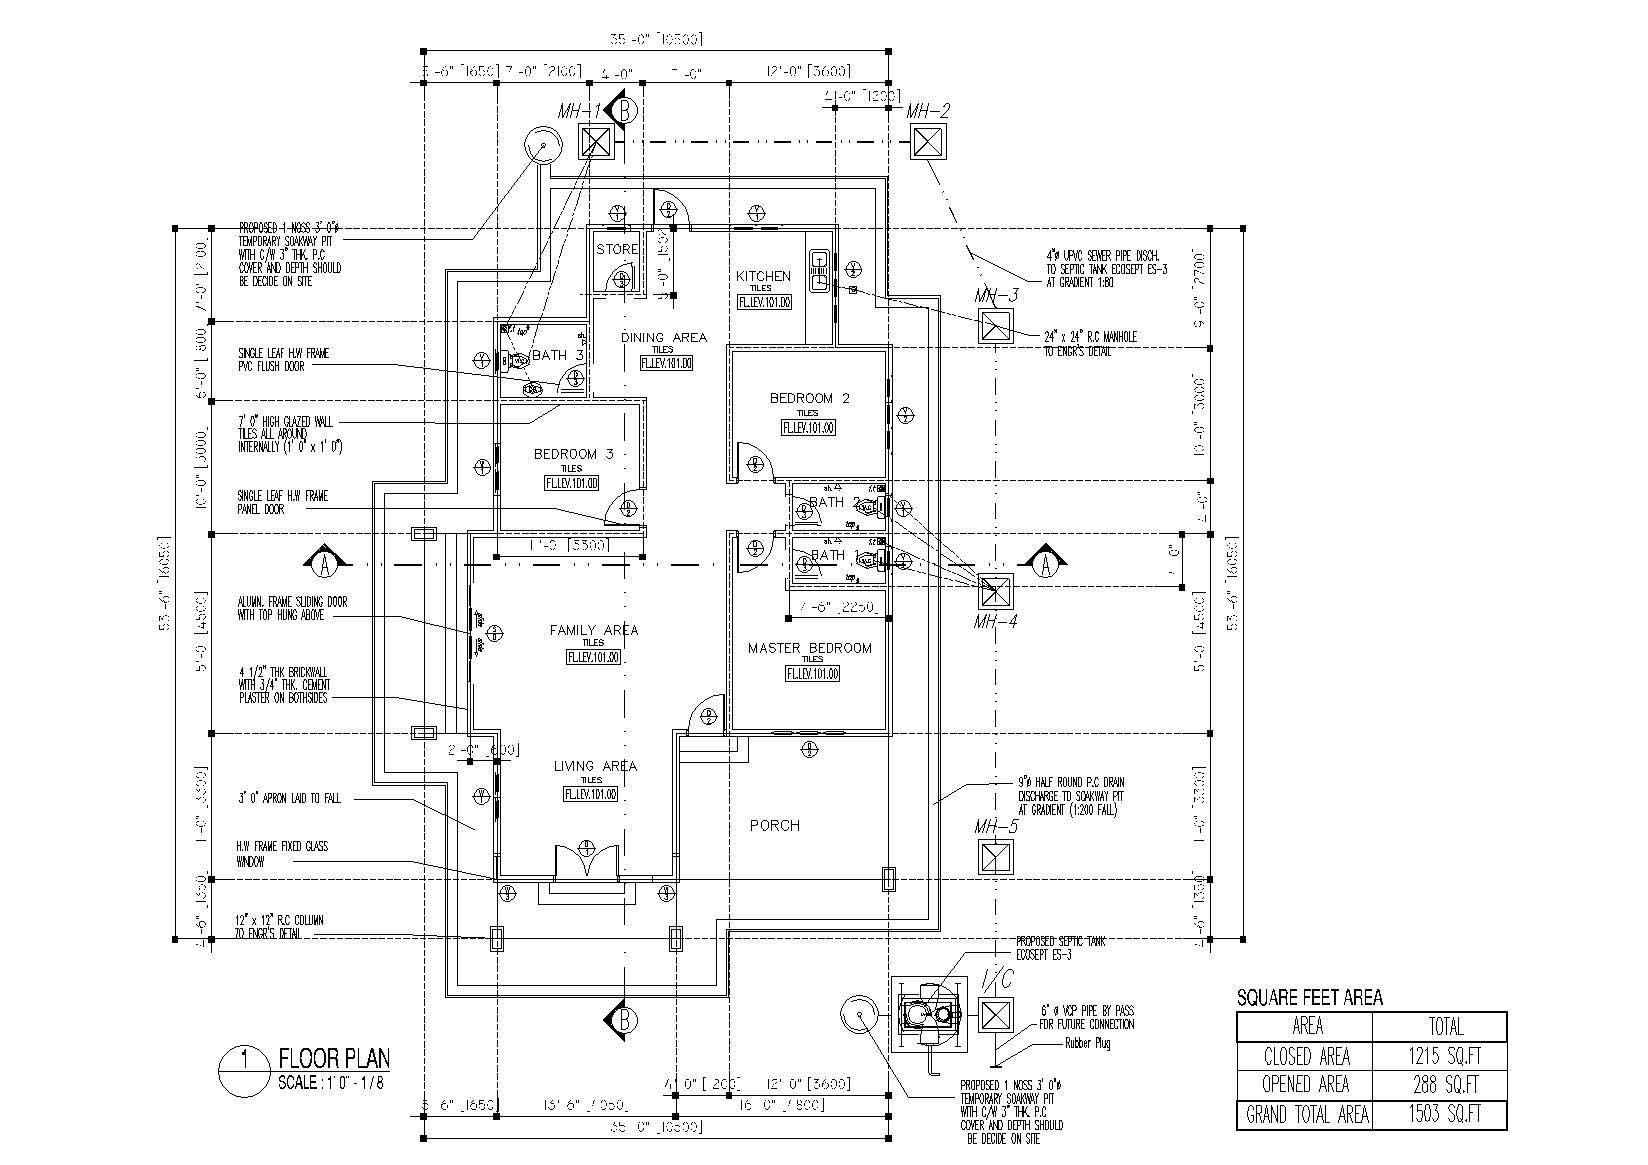 plan arkitek bridgeasia property